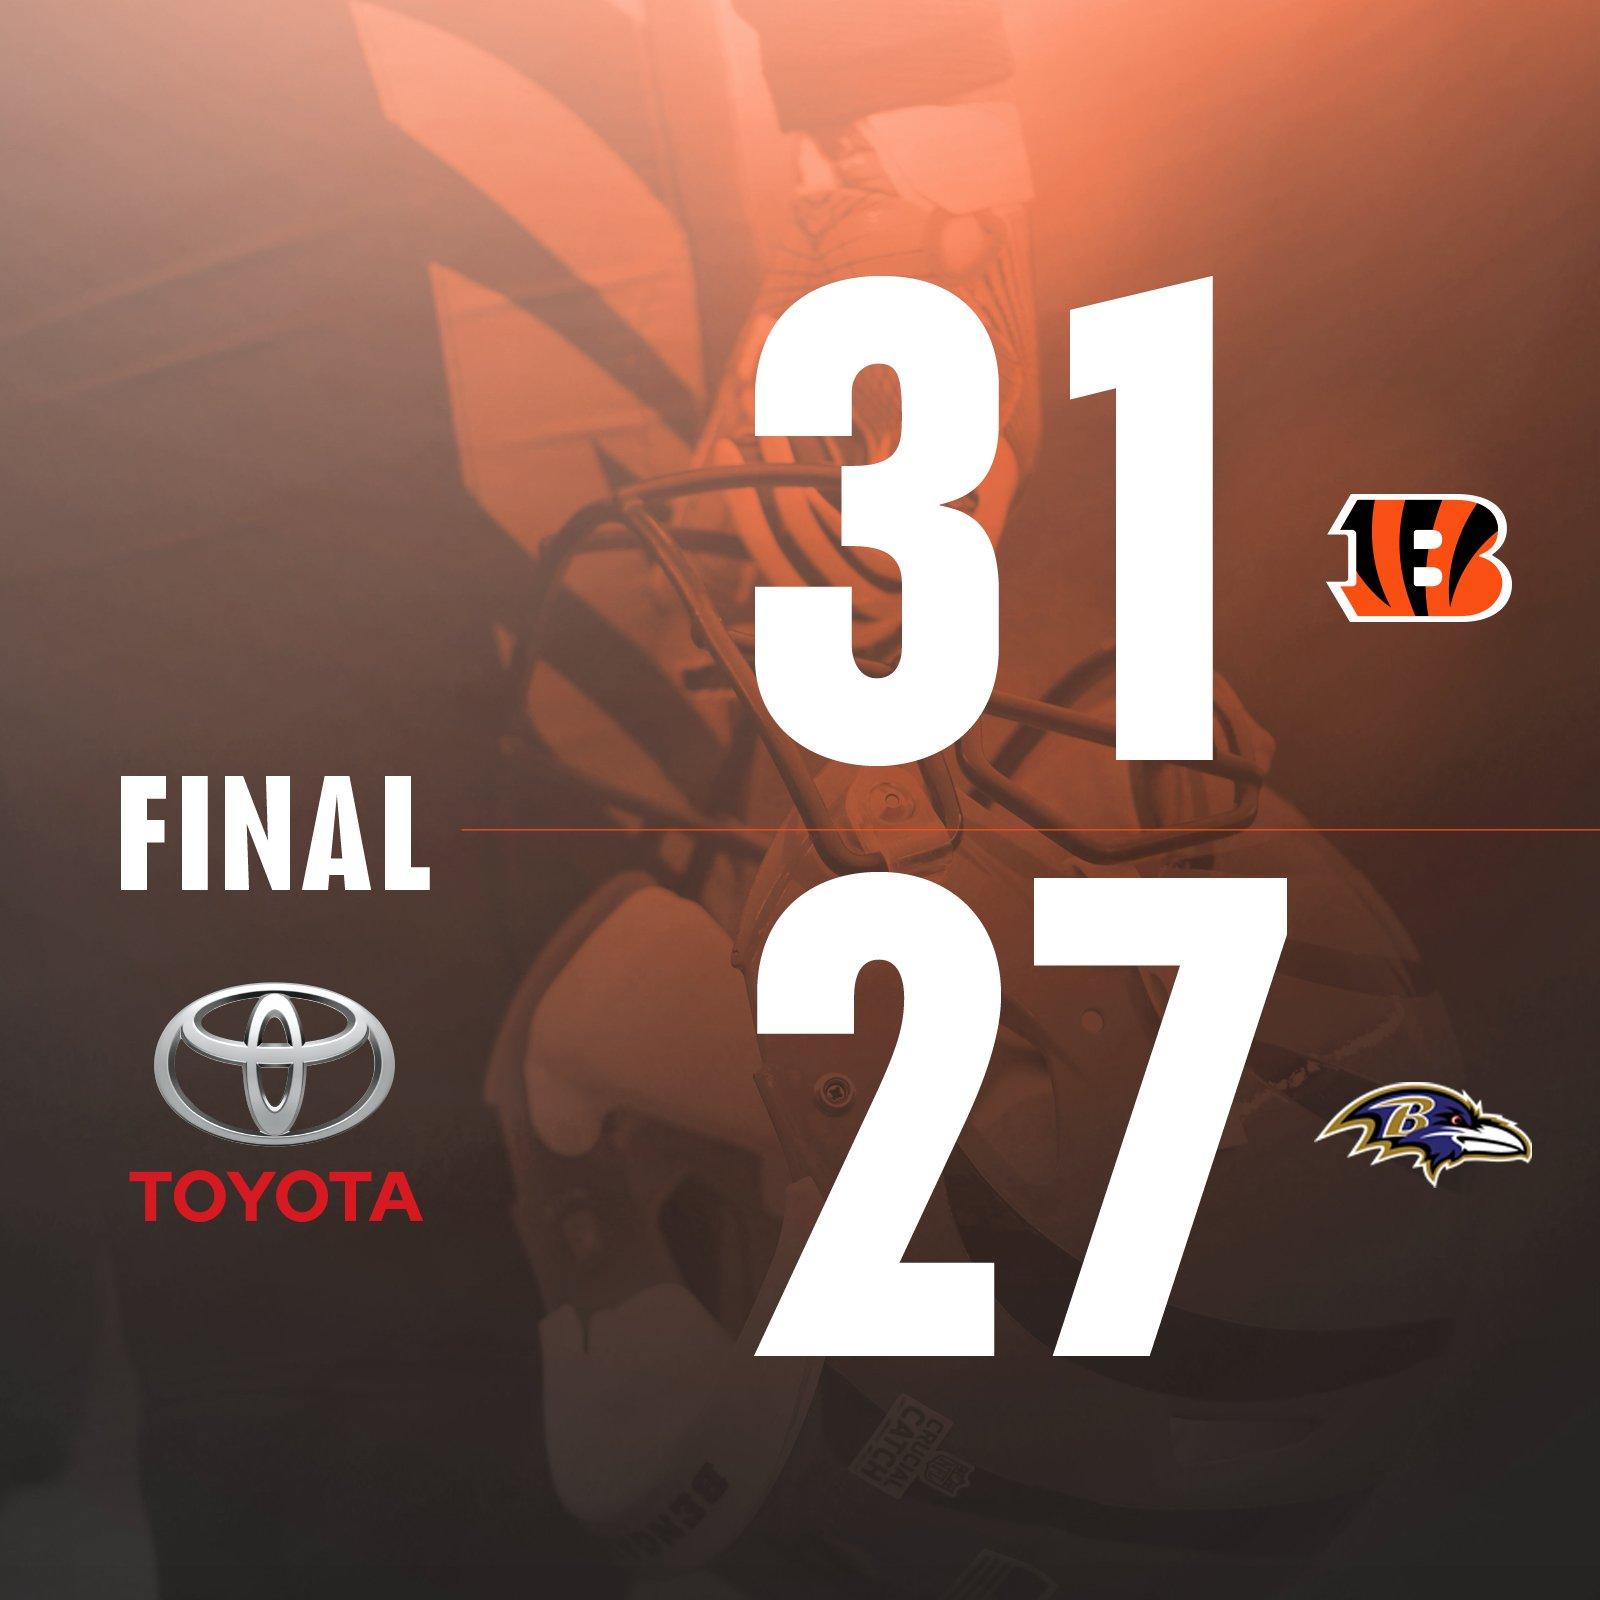 #Bengals finish the season with a WIN! #CINvsBAL #Bengals50   @Toyota Game Recap: https://t.co/v48ukzQnAj https://t.co/PgEQAesezS